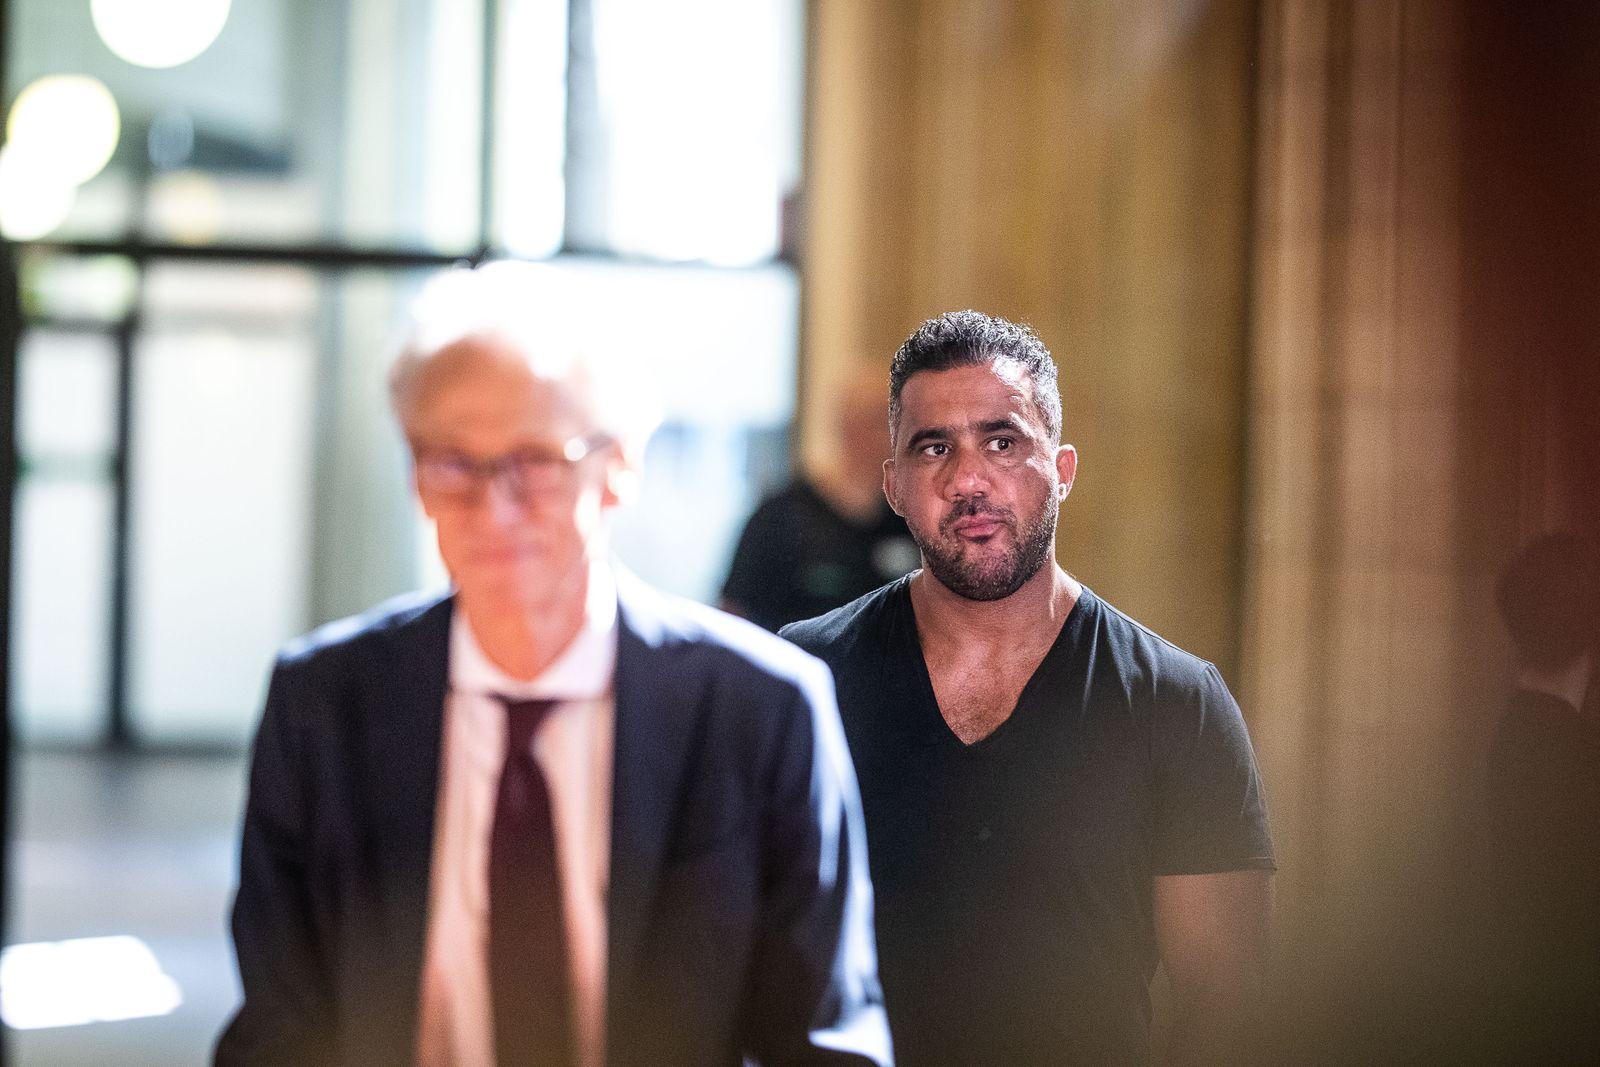 Prozessauftakt Bushido vs Arafat Abou-Chaker am Landgericht Berlin